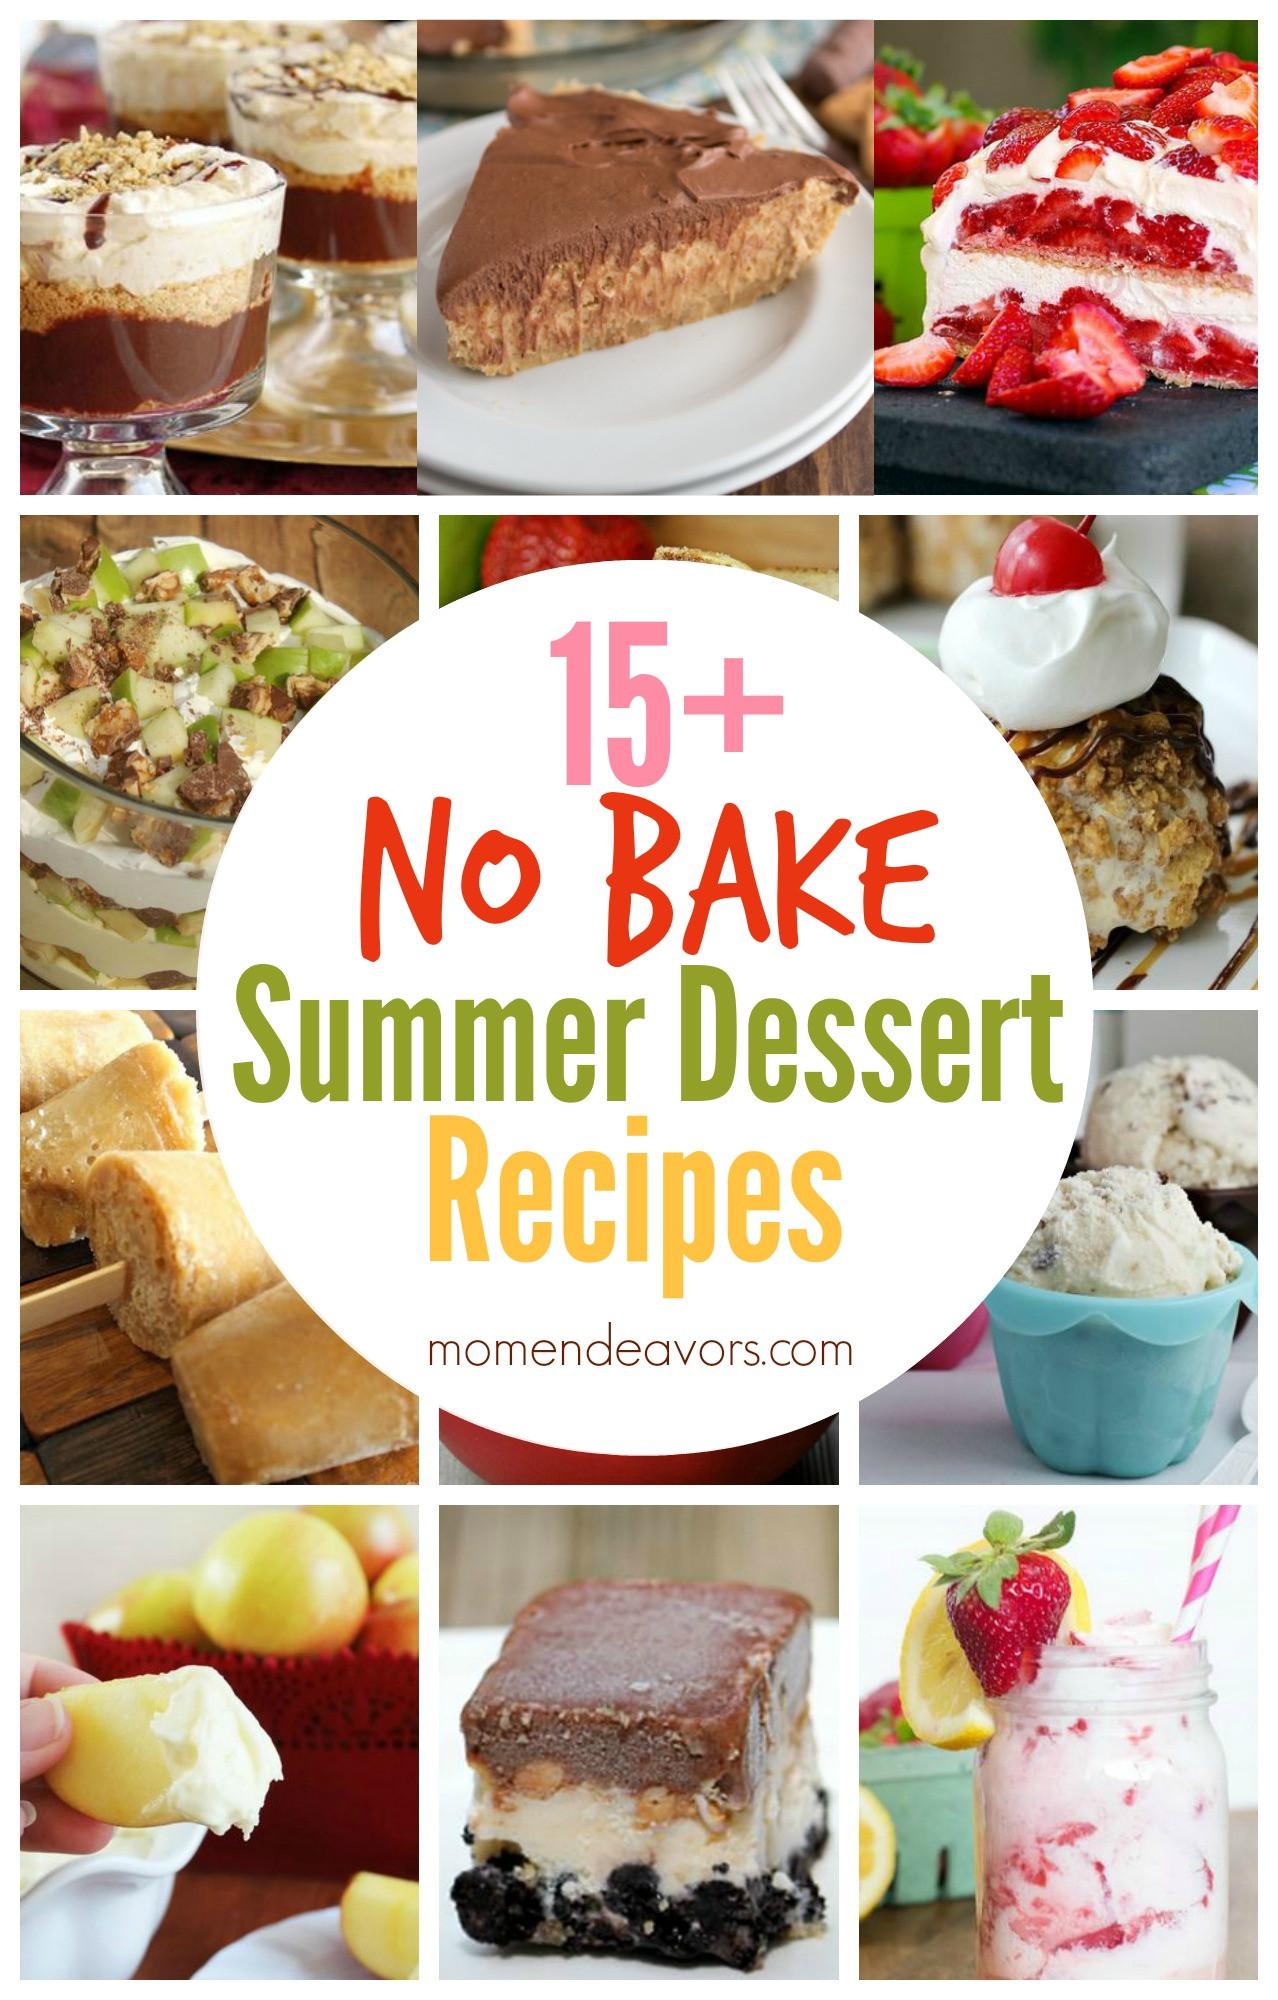 Summer No Bake Desserts  15 No Bake Summer Dessert Recipes